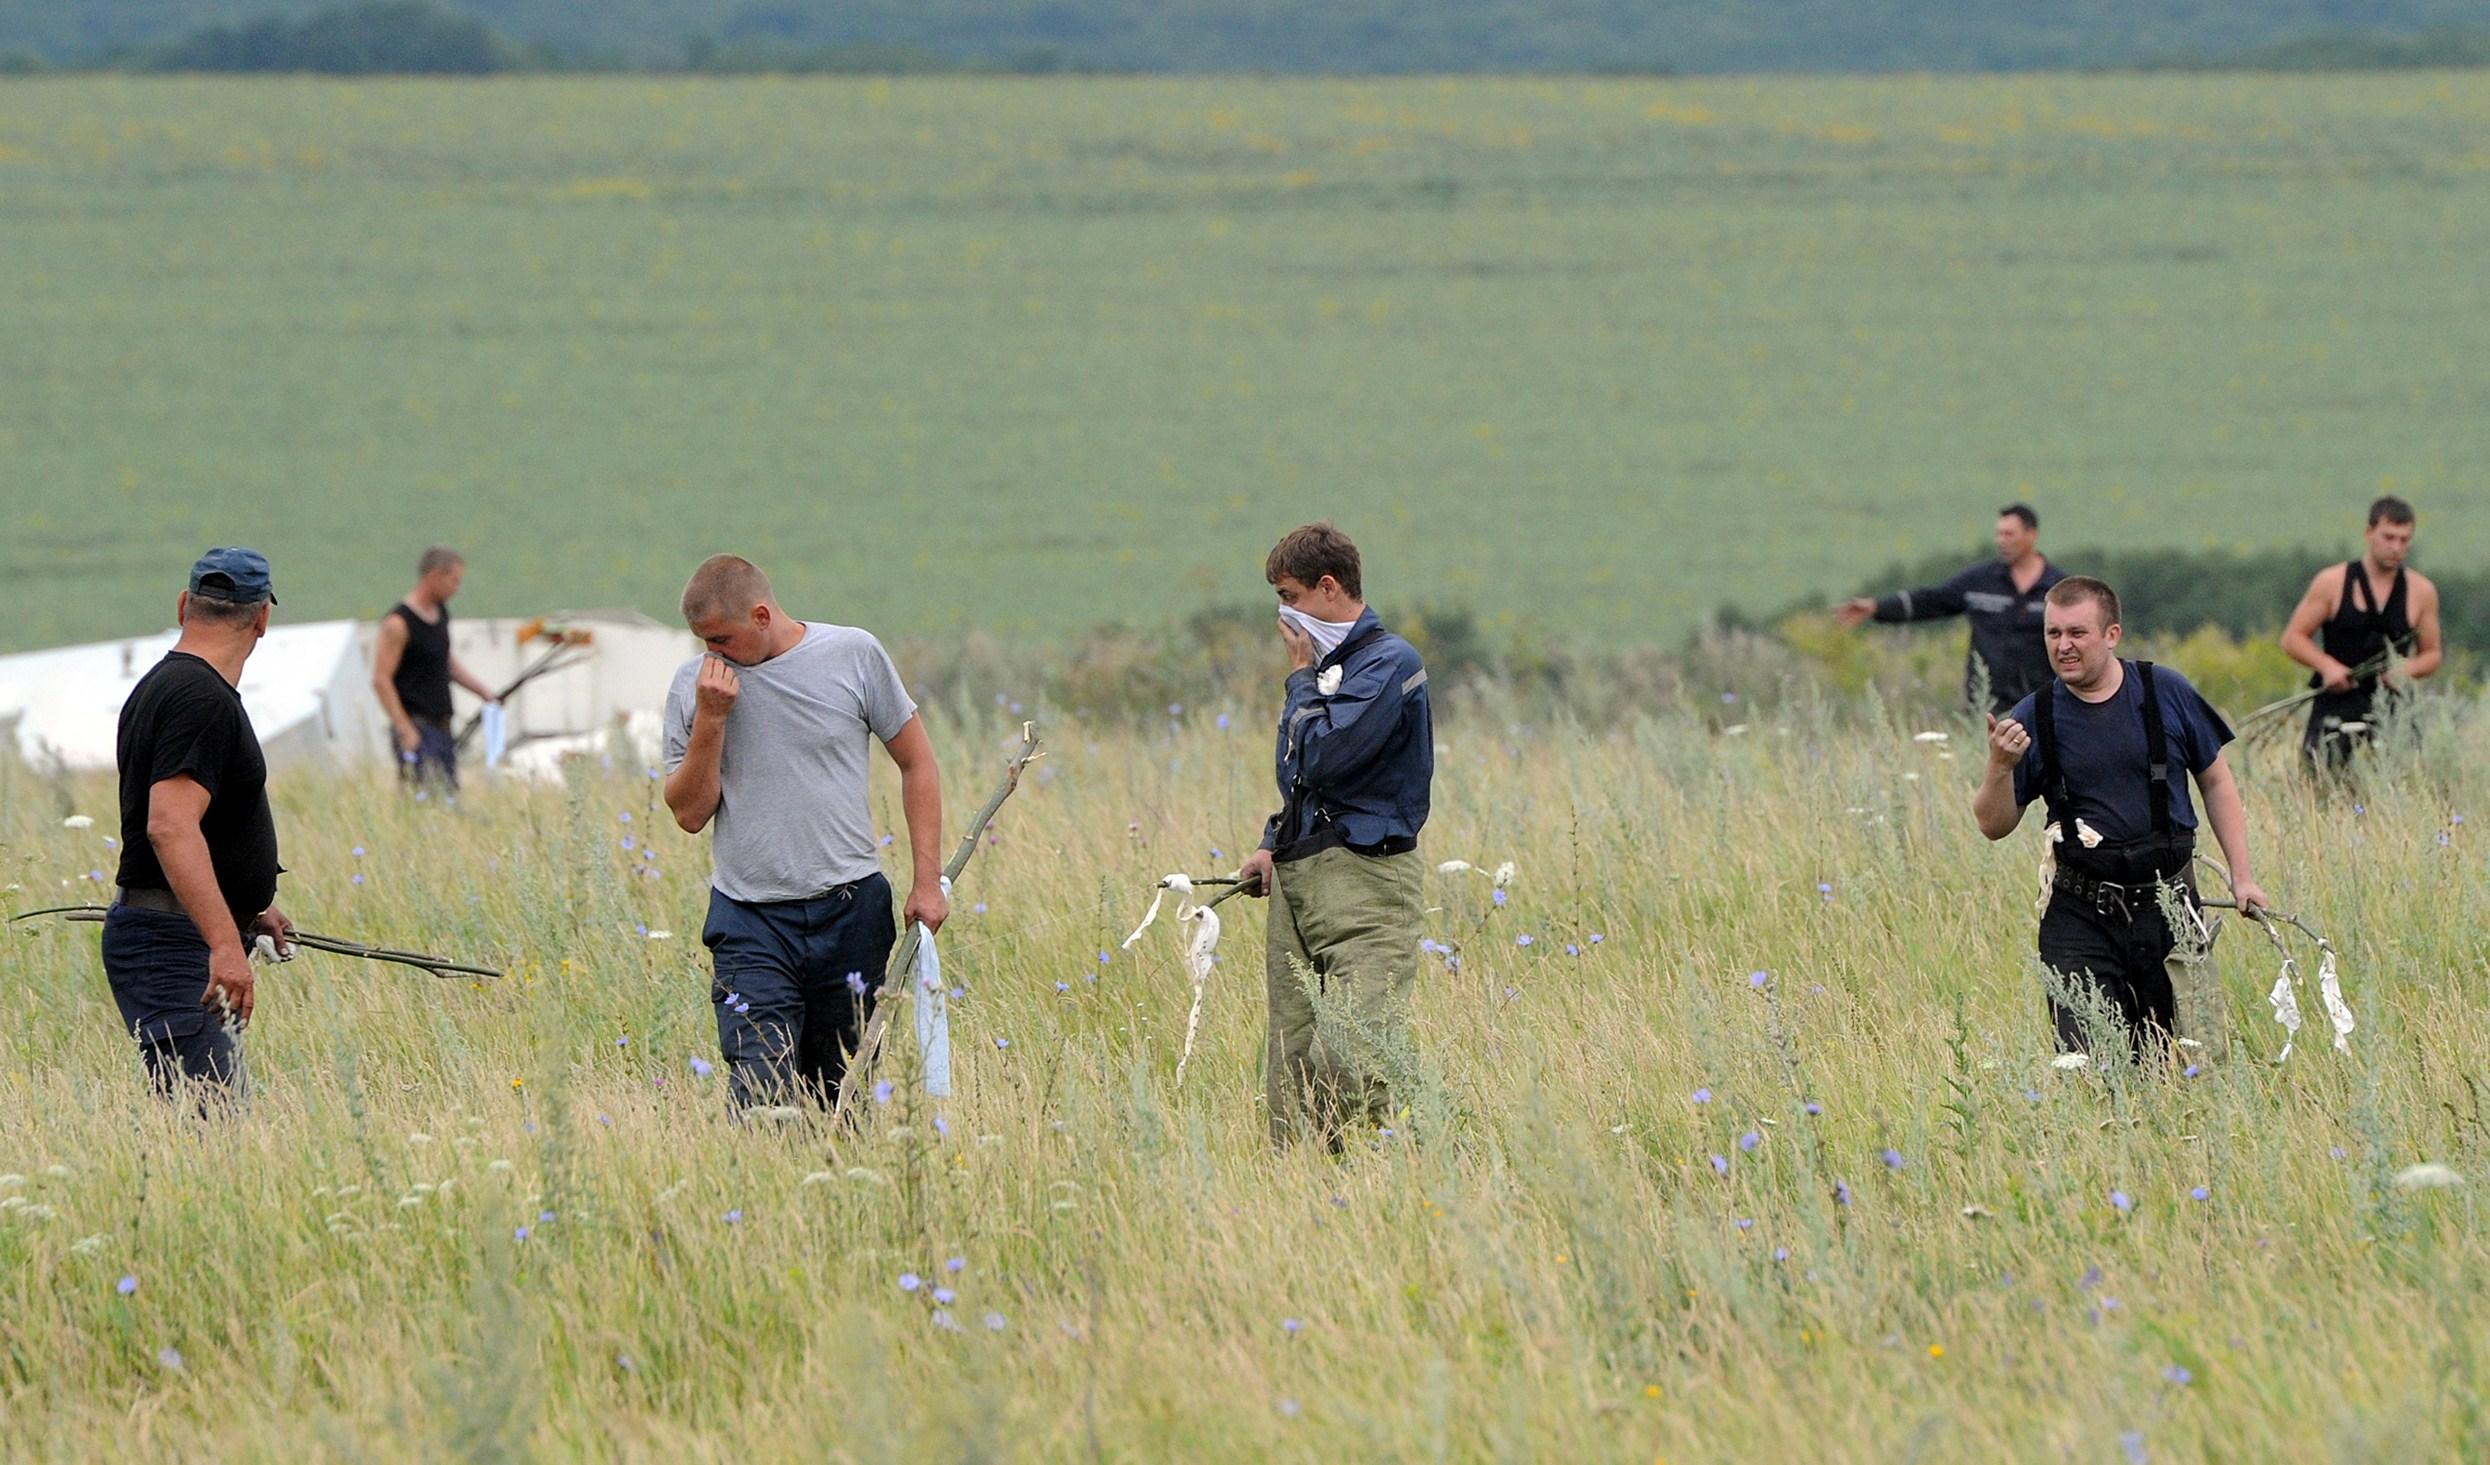 Catastrofa aviatica din Ucraina. Expertii parasesc o parte a zonei in care s-a prabusit zborul MH17 din cauza luptelor